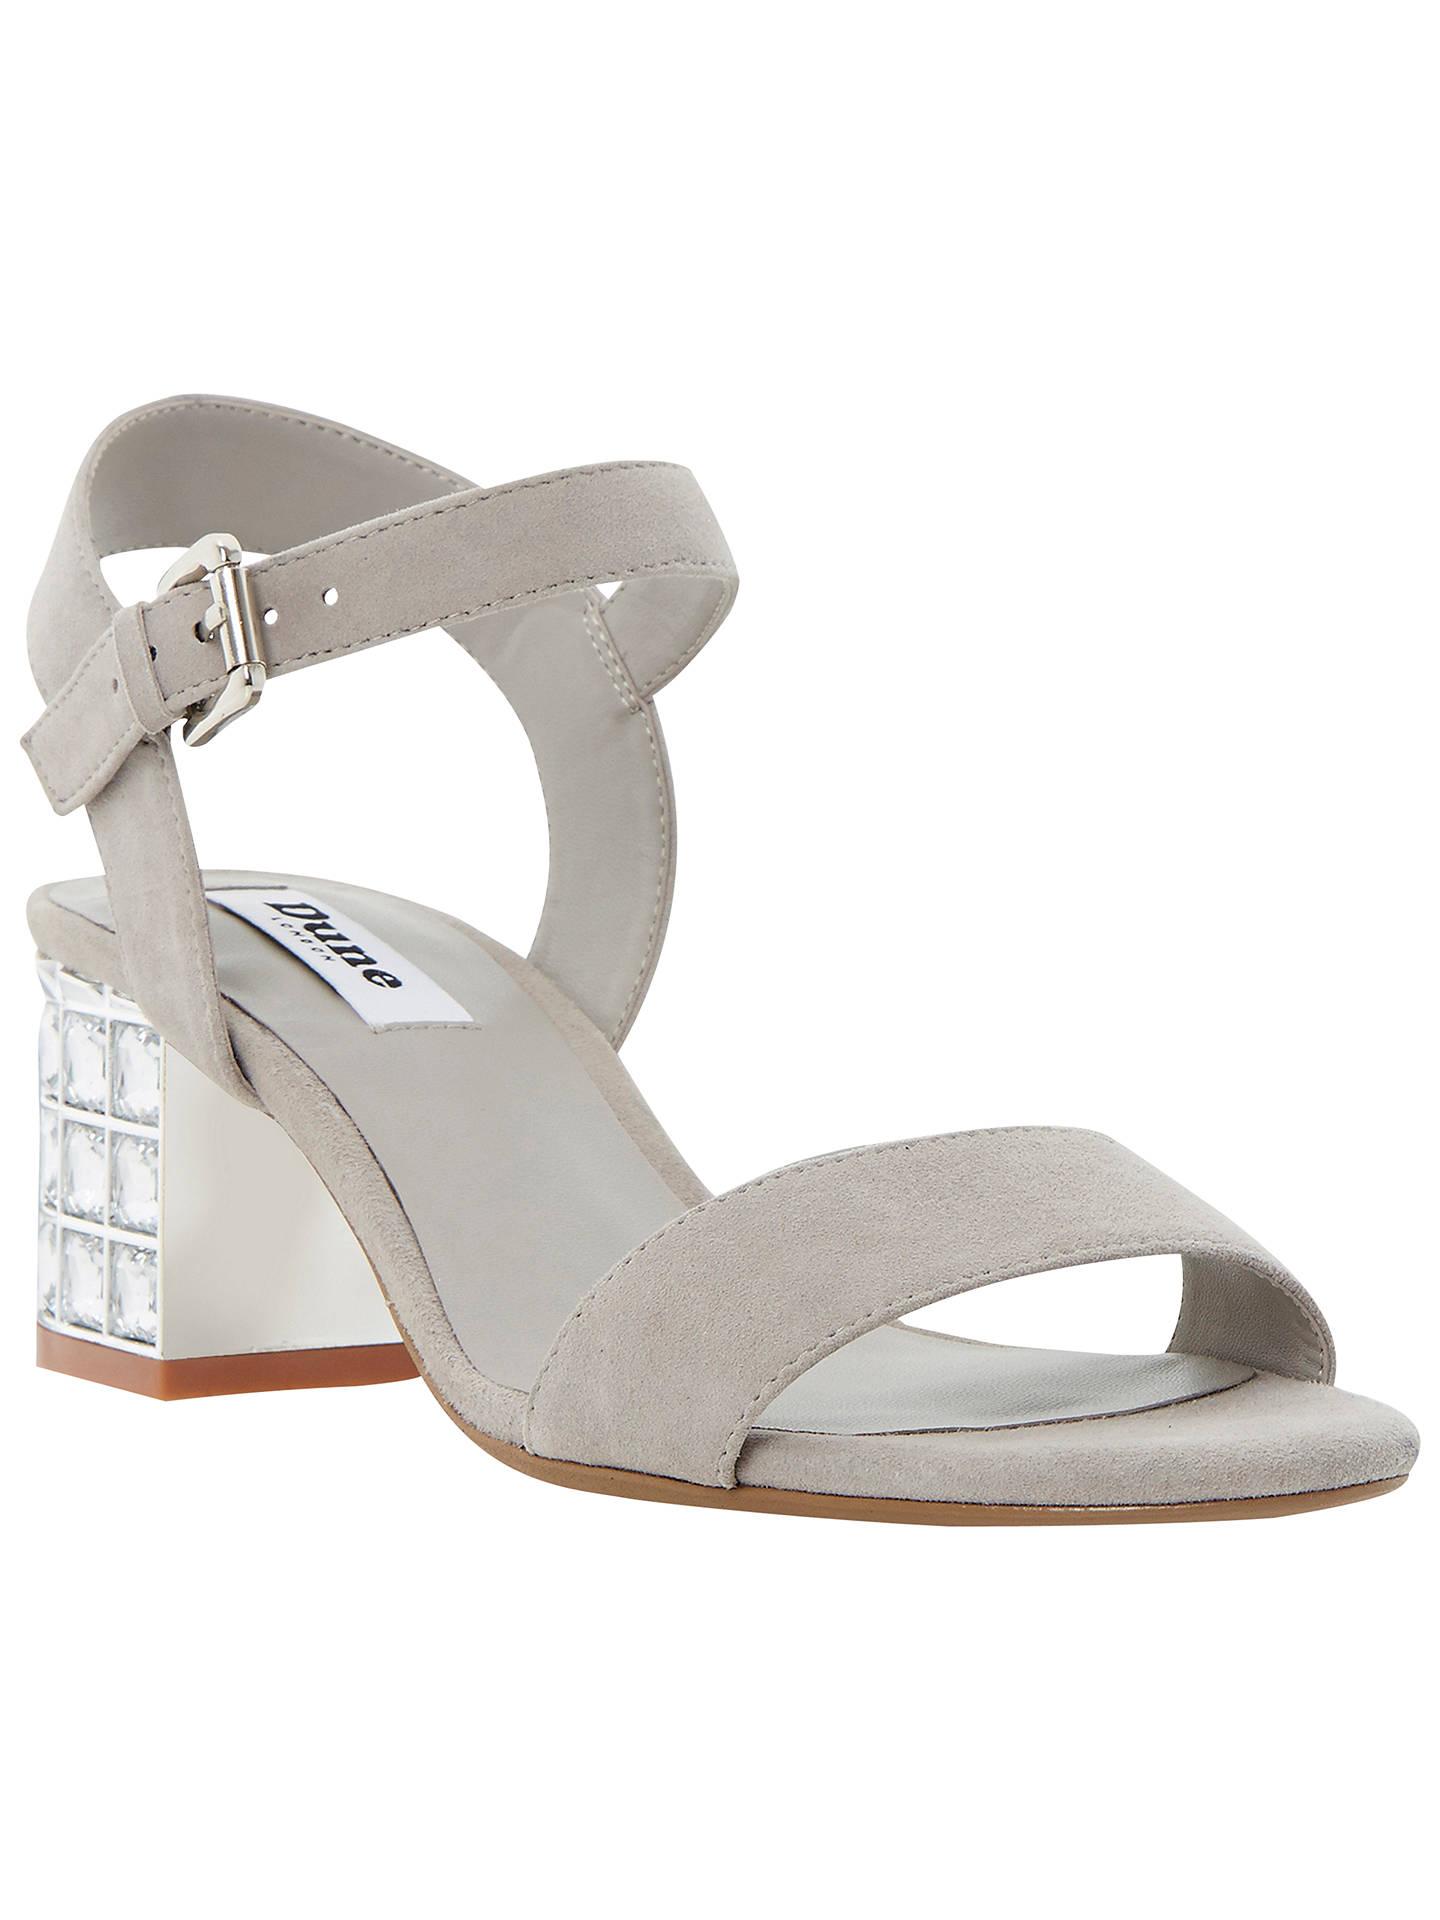 cfcc5ff7e30 Buy Dune Harah Jewelled Block Heeled Sandals